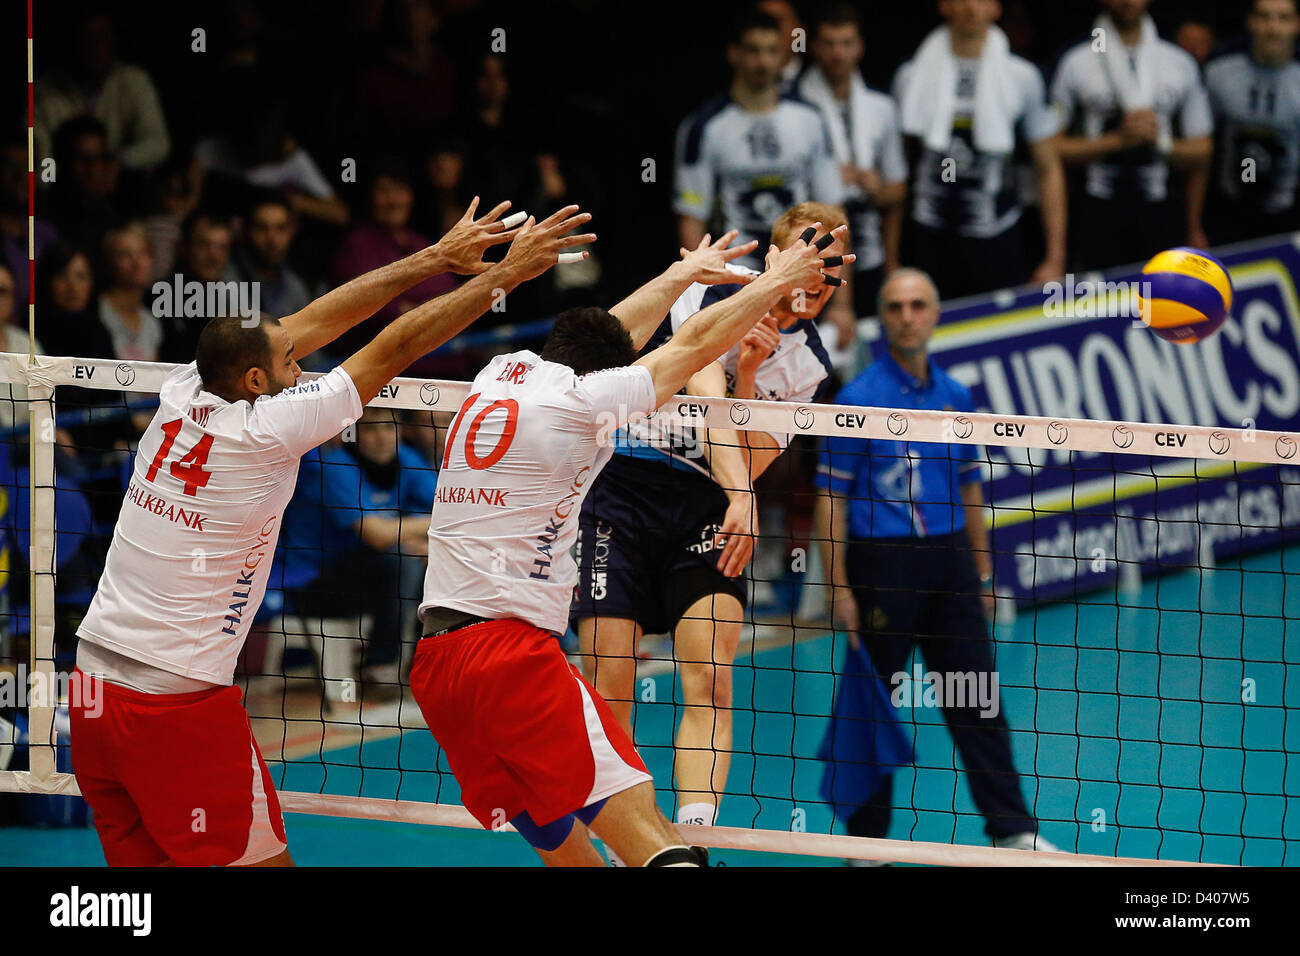 Latina, Italia. El 27 de febrero de 2013. Jakub Jarosz Wladyslaw hits dentro del bloack durante la final de la Copa Imagen De Stock